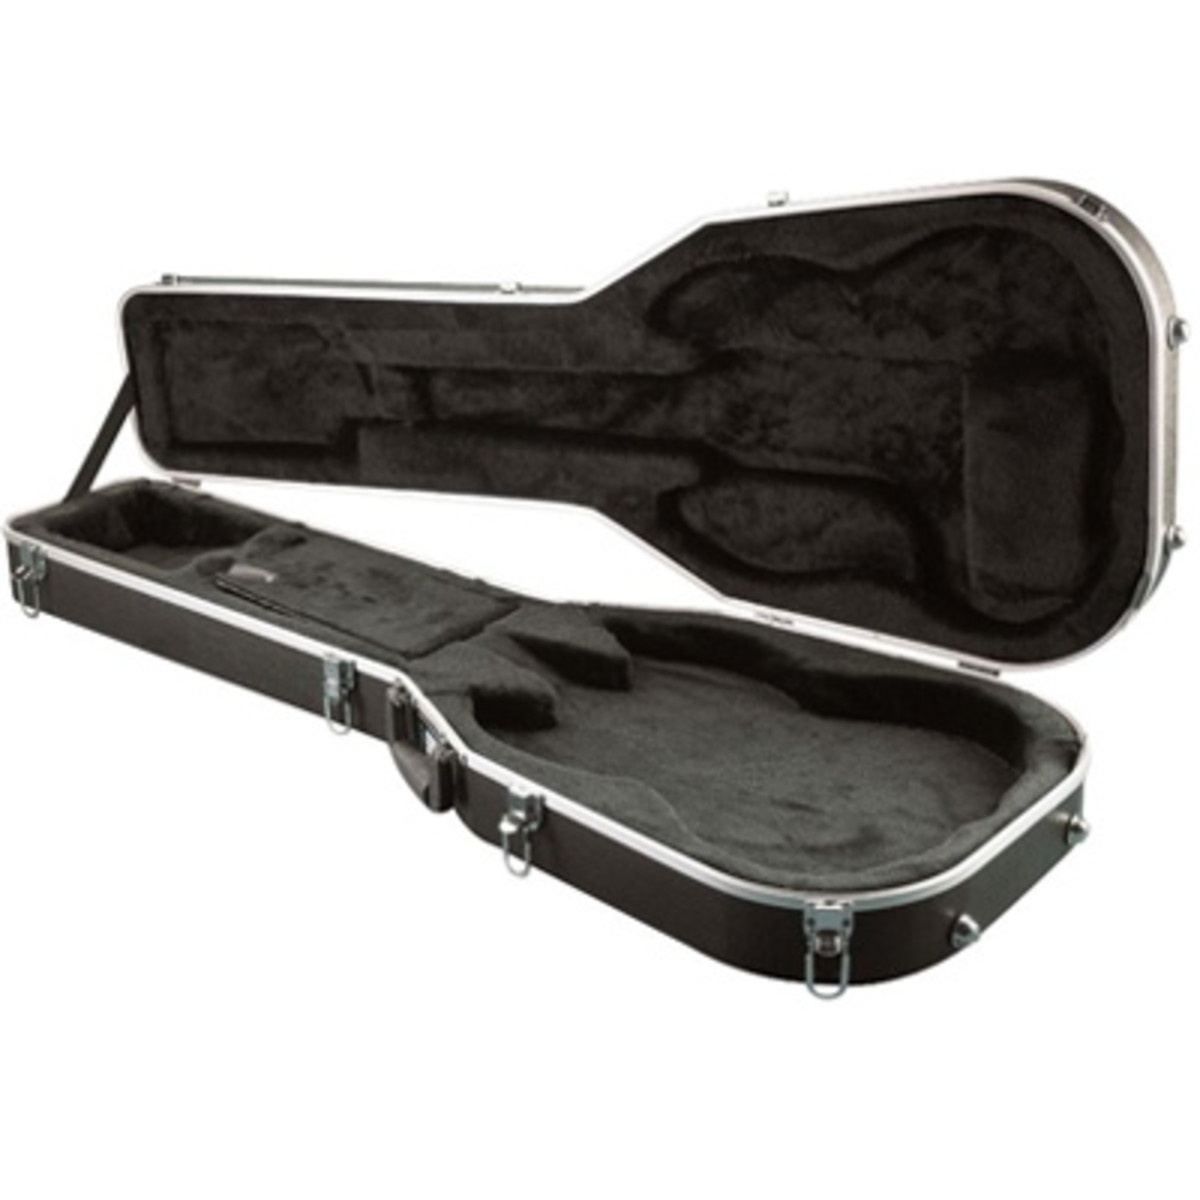 gator deluxe electric guitar case at. Black Bedroom Furniture Sets. Home Design Ideas